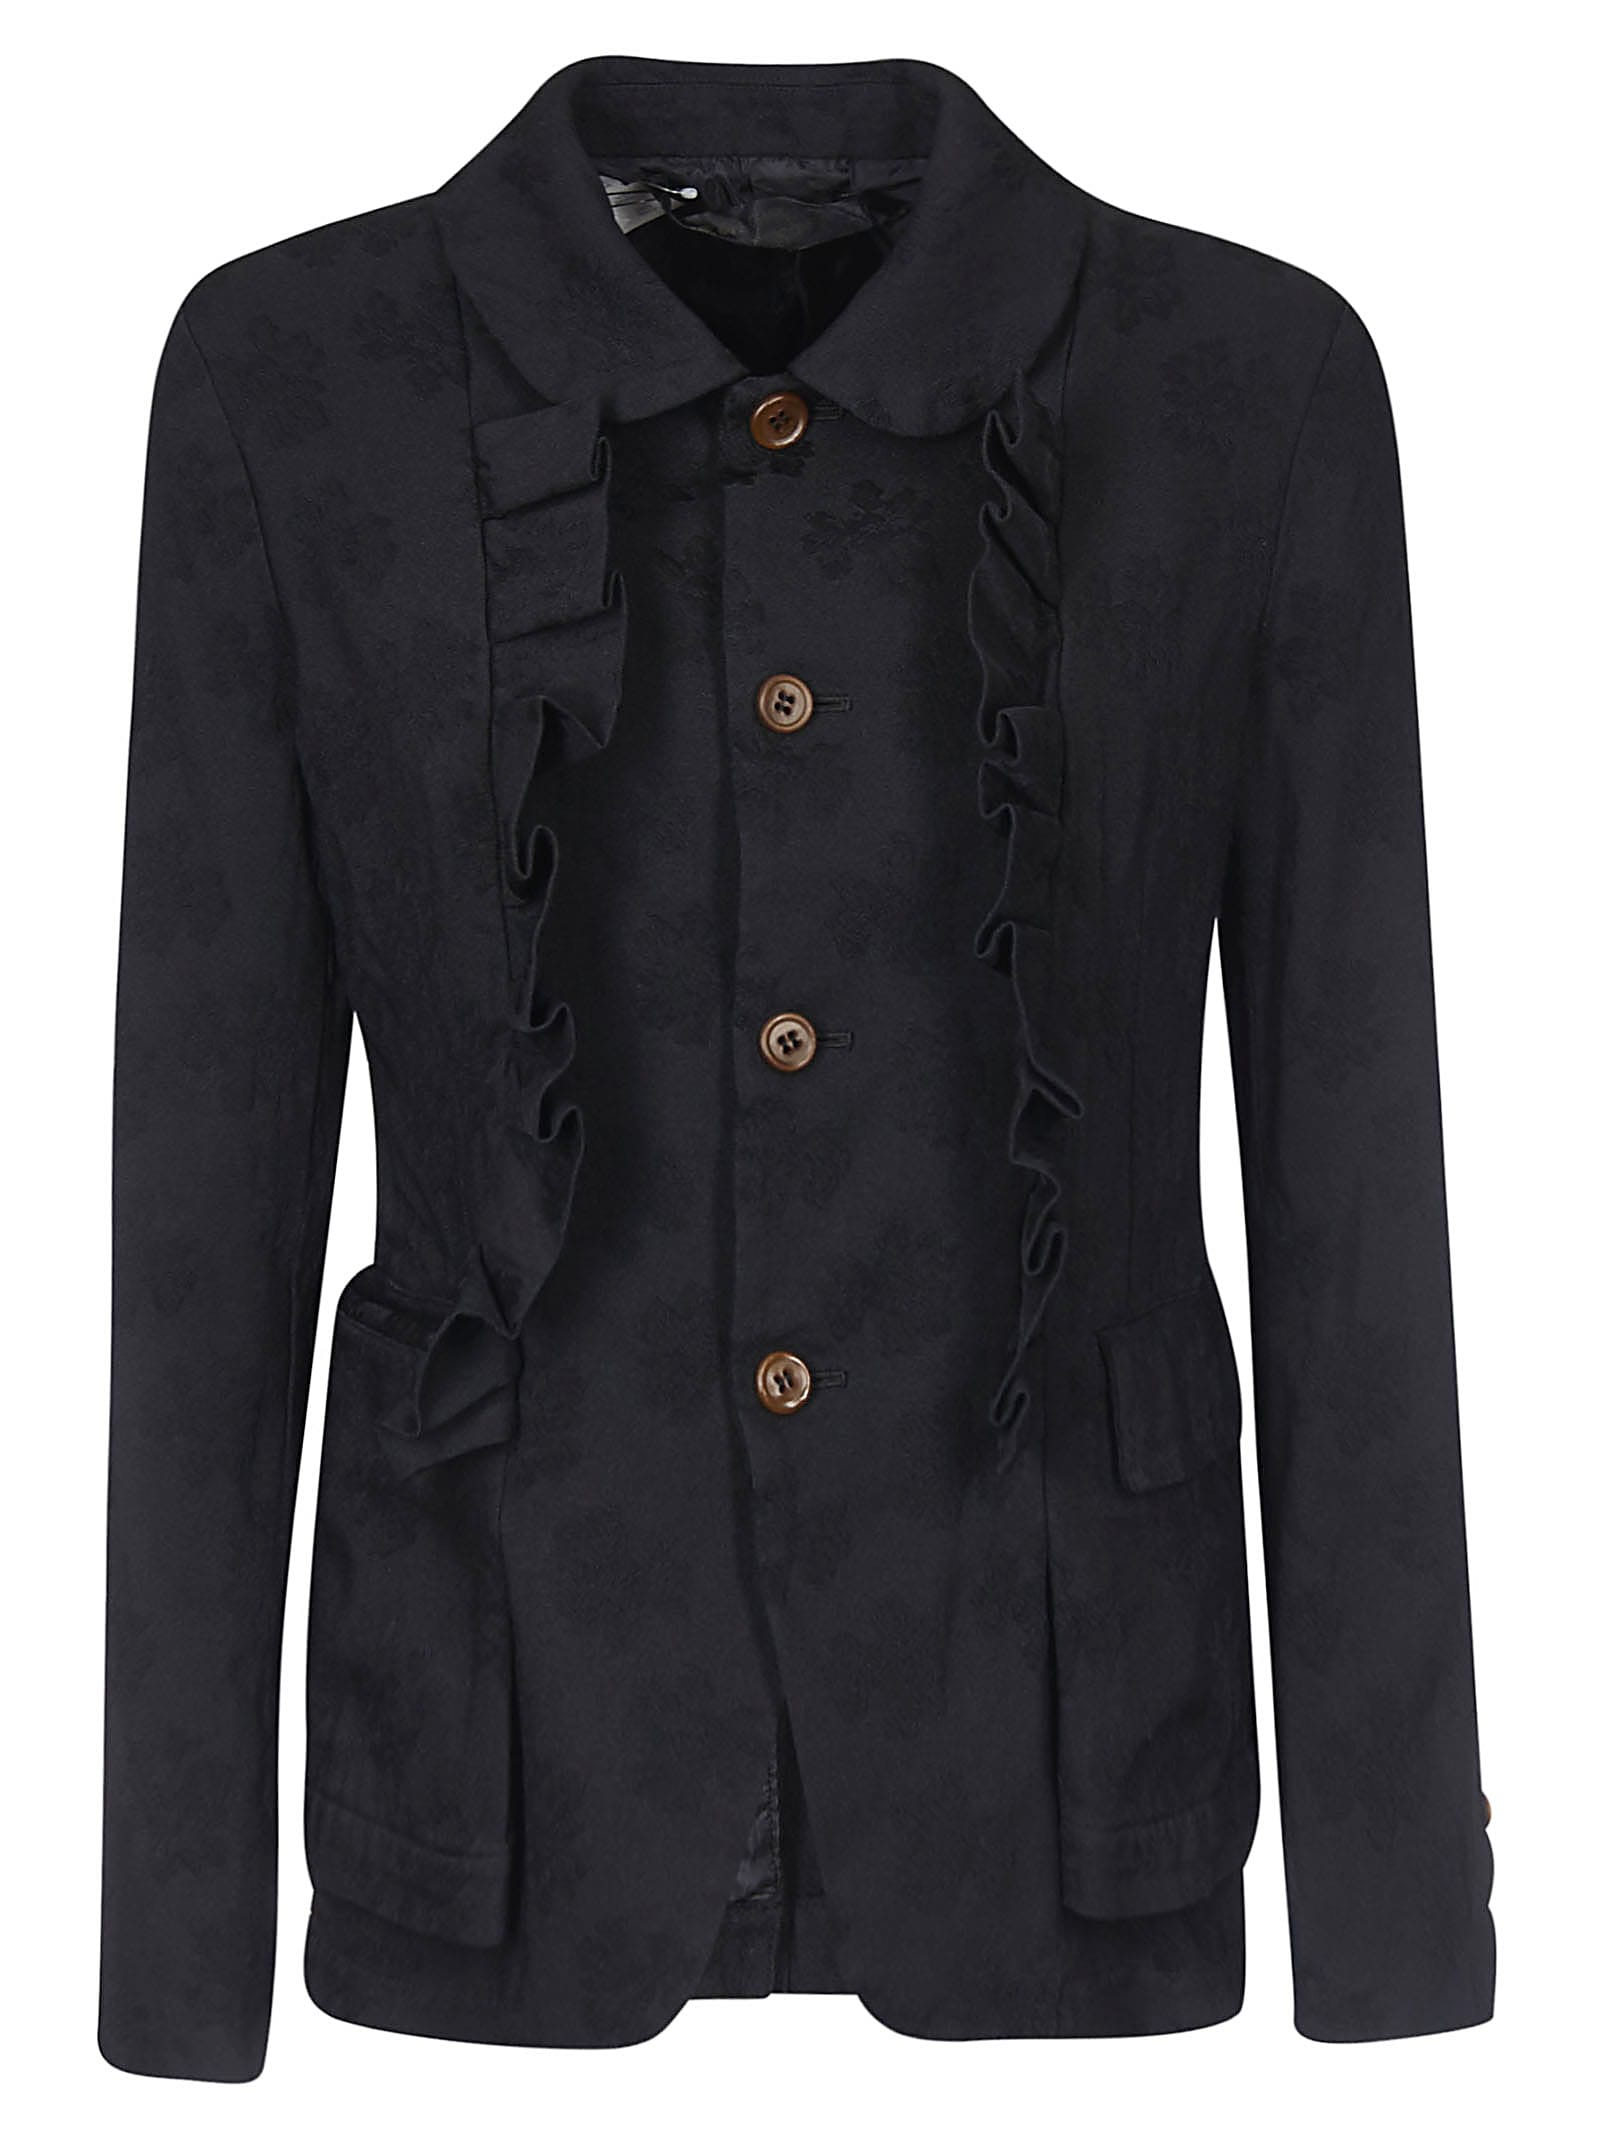 Photo of  Comme des Garçons Ruffle Detailed Jacket- shop Comme des Garçons jackets online sales